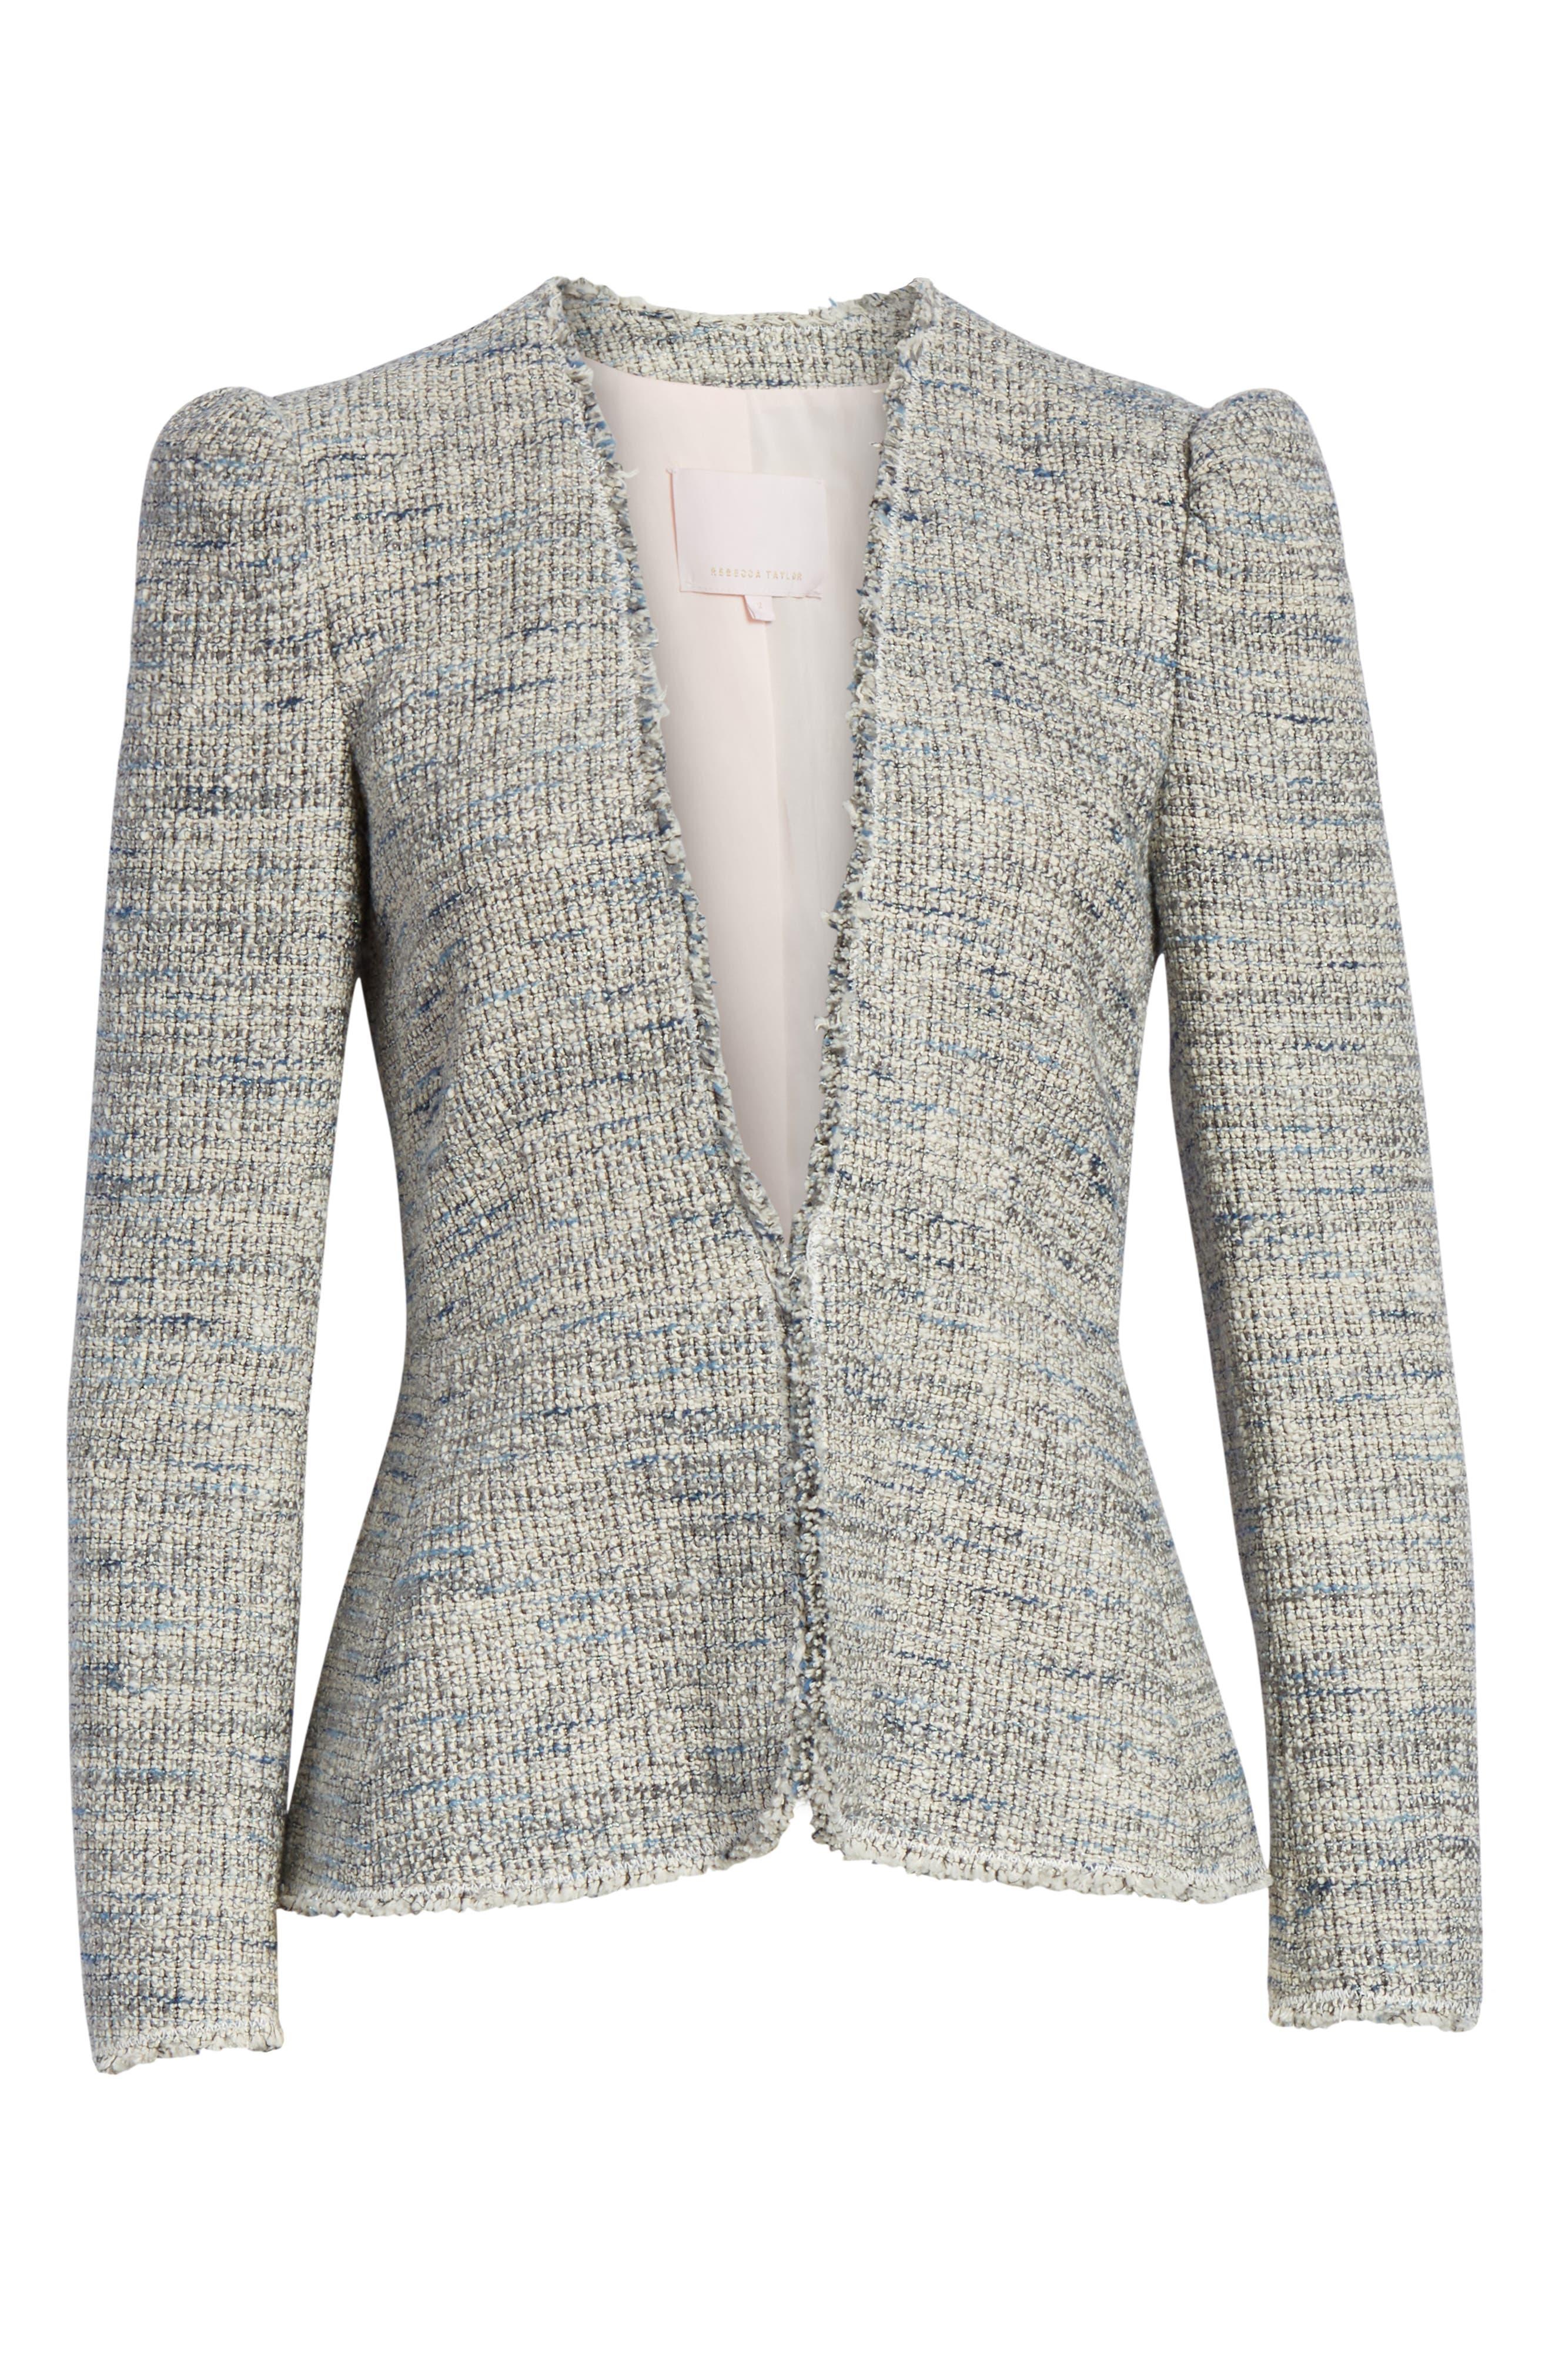 REBECCA TAYLOR, Tweed Peplum Jacket, Alternate thumbnail 6, color, BLUE/ GREY COMBO